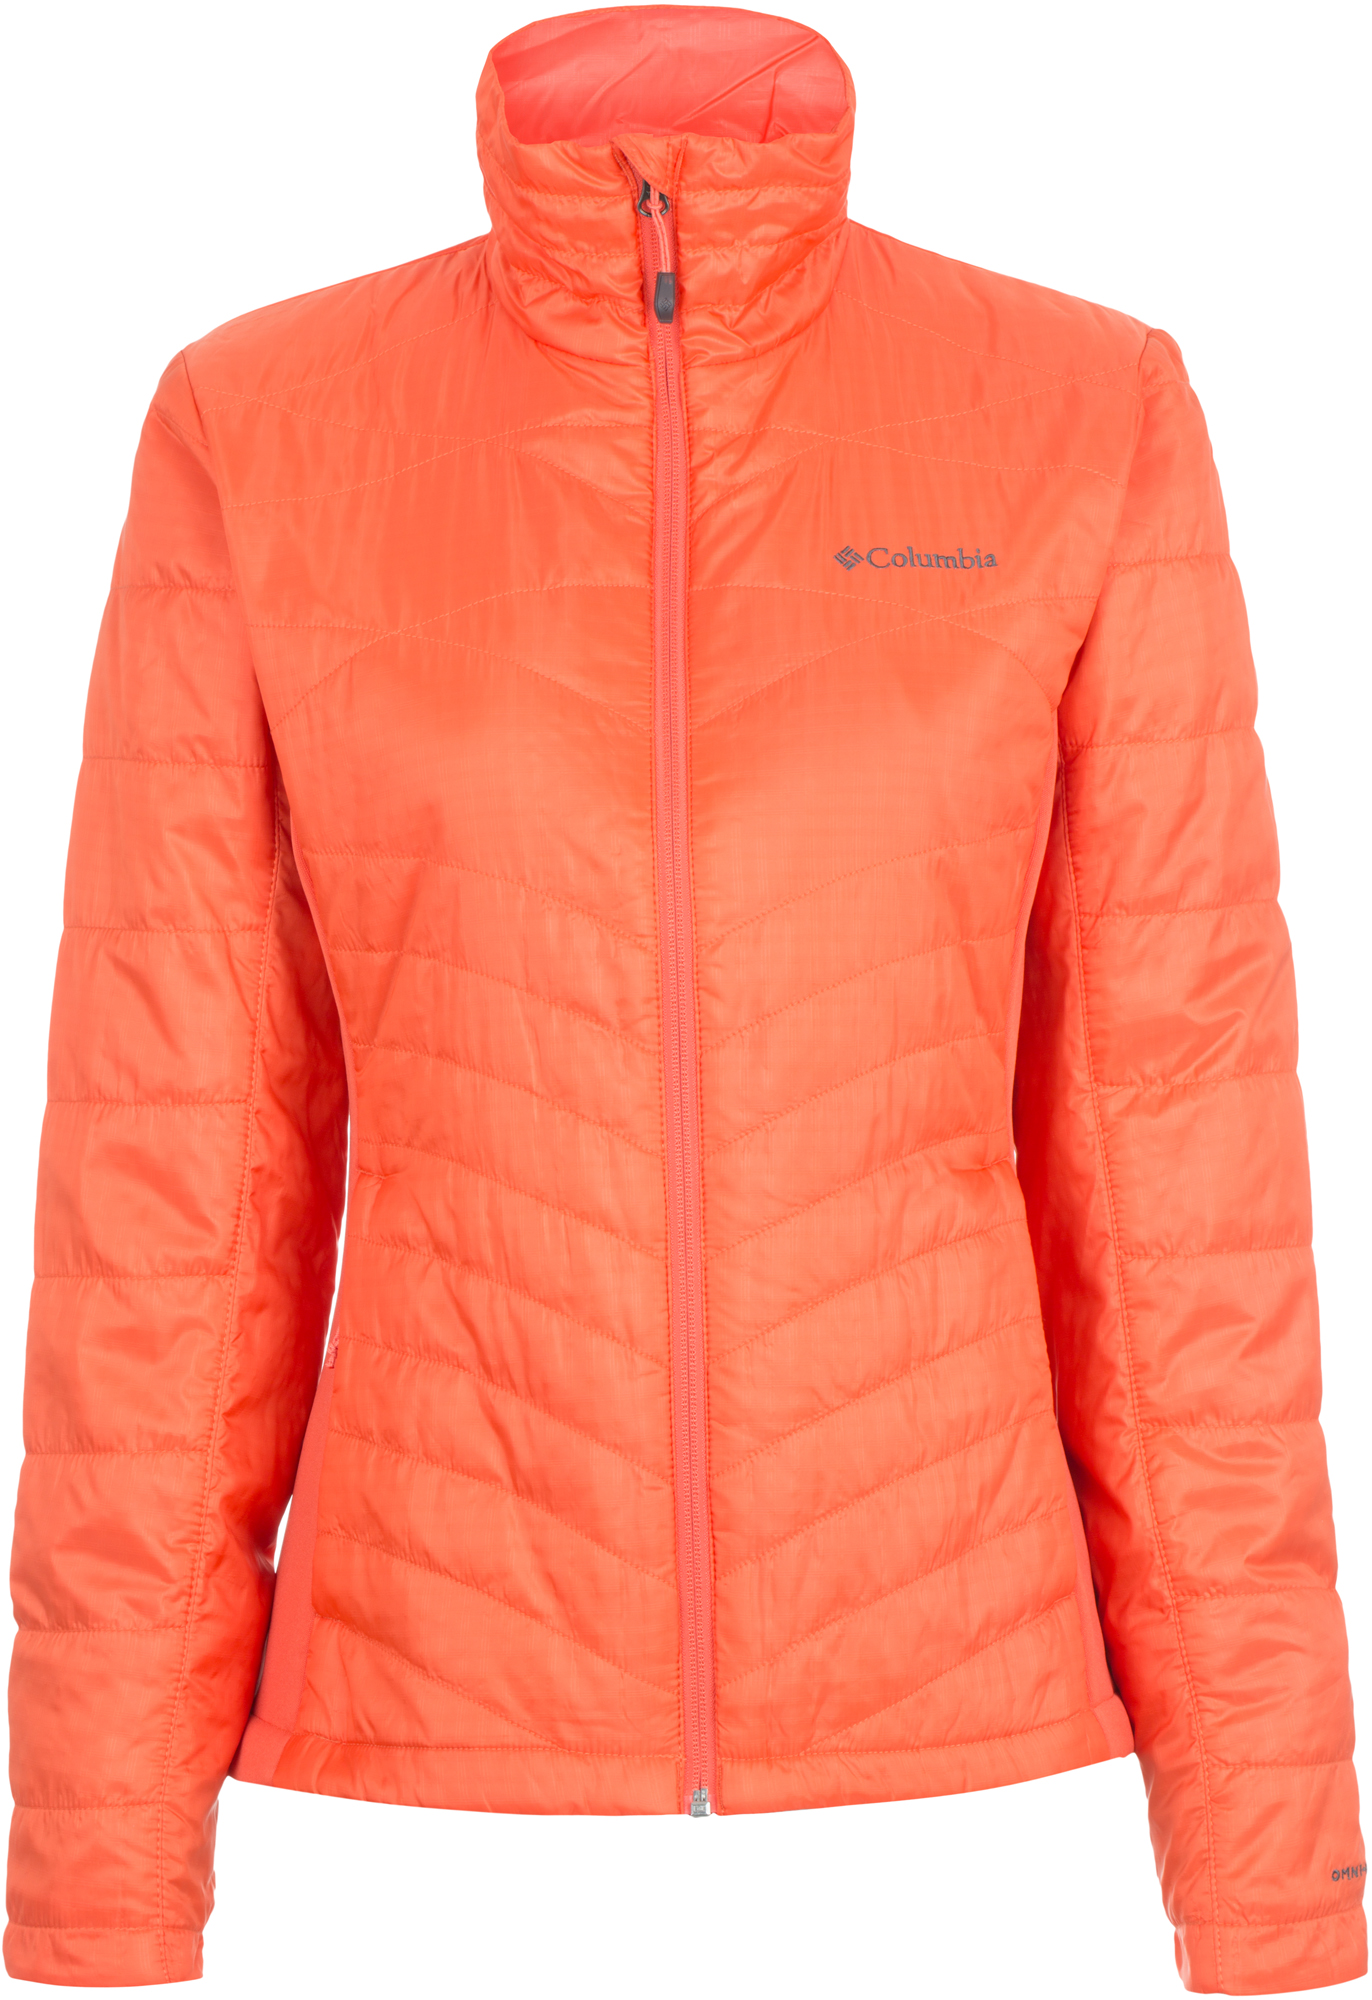 цена  Columbia Куртка утепленная женская Columbia Mighty Lite  онлайн в 2017 году